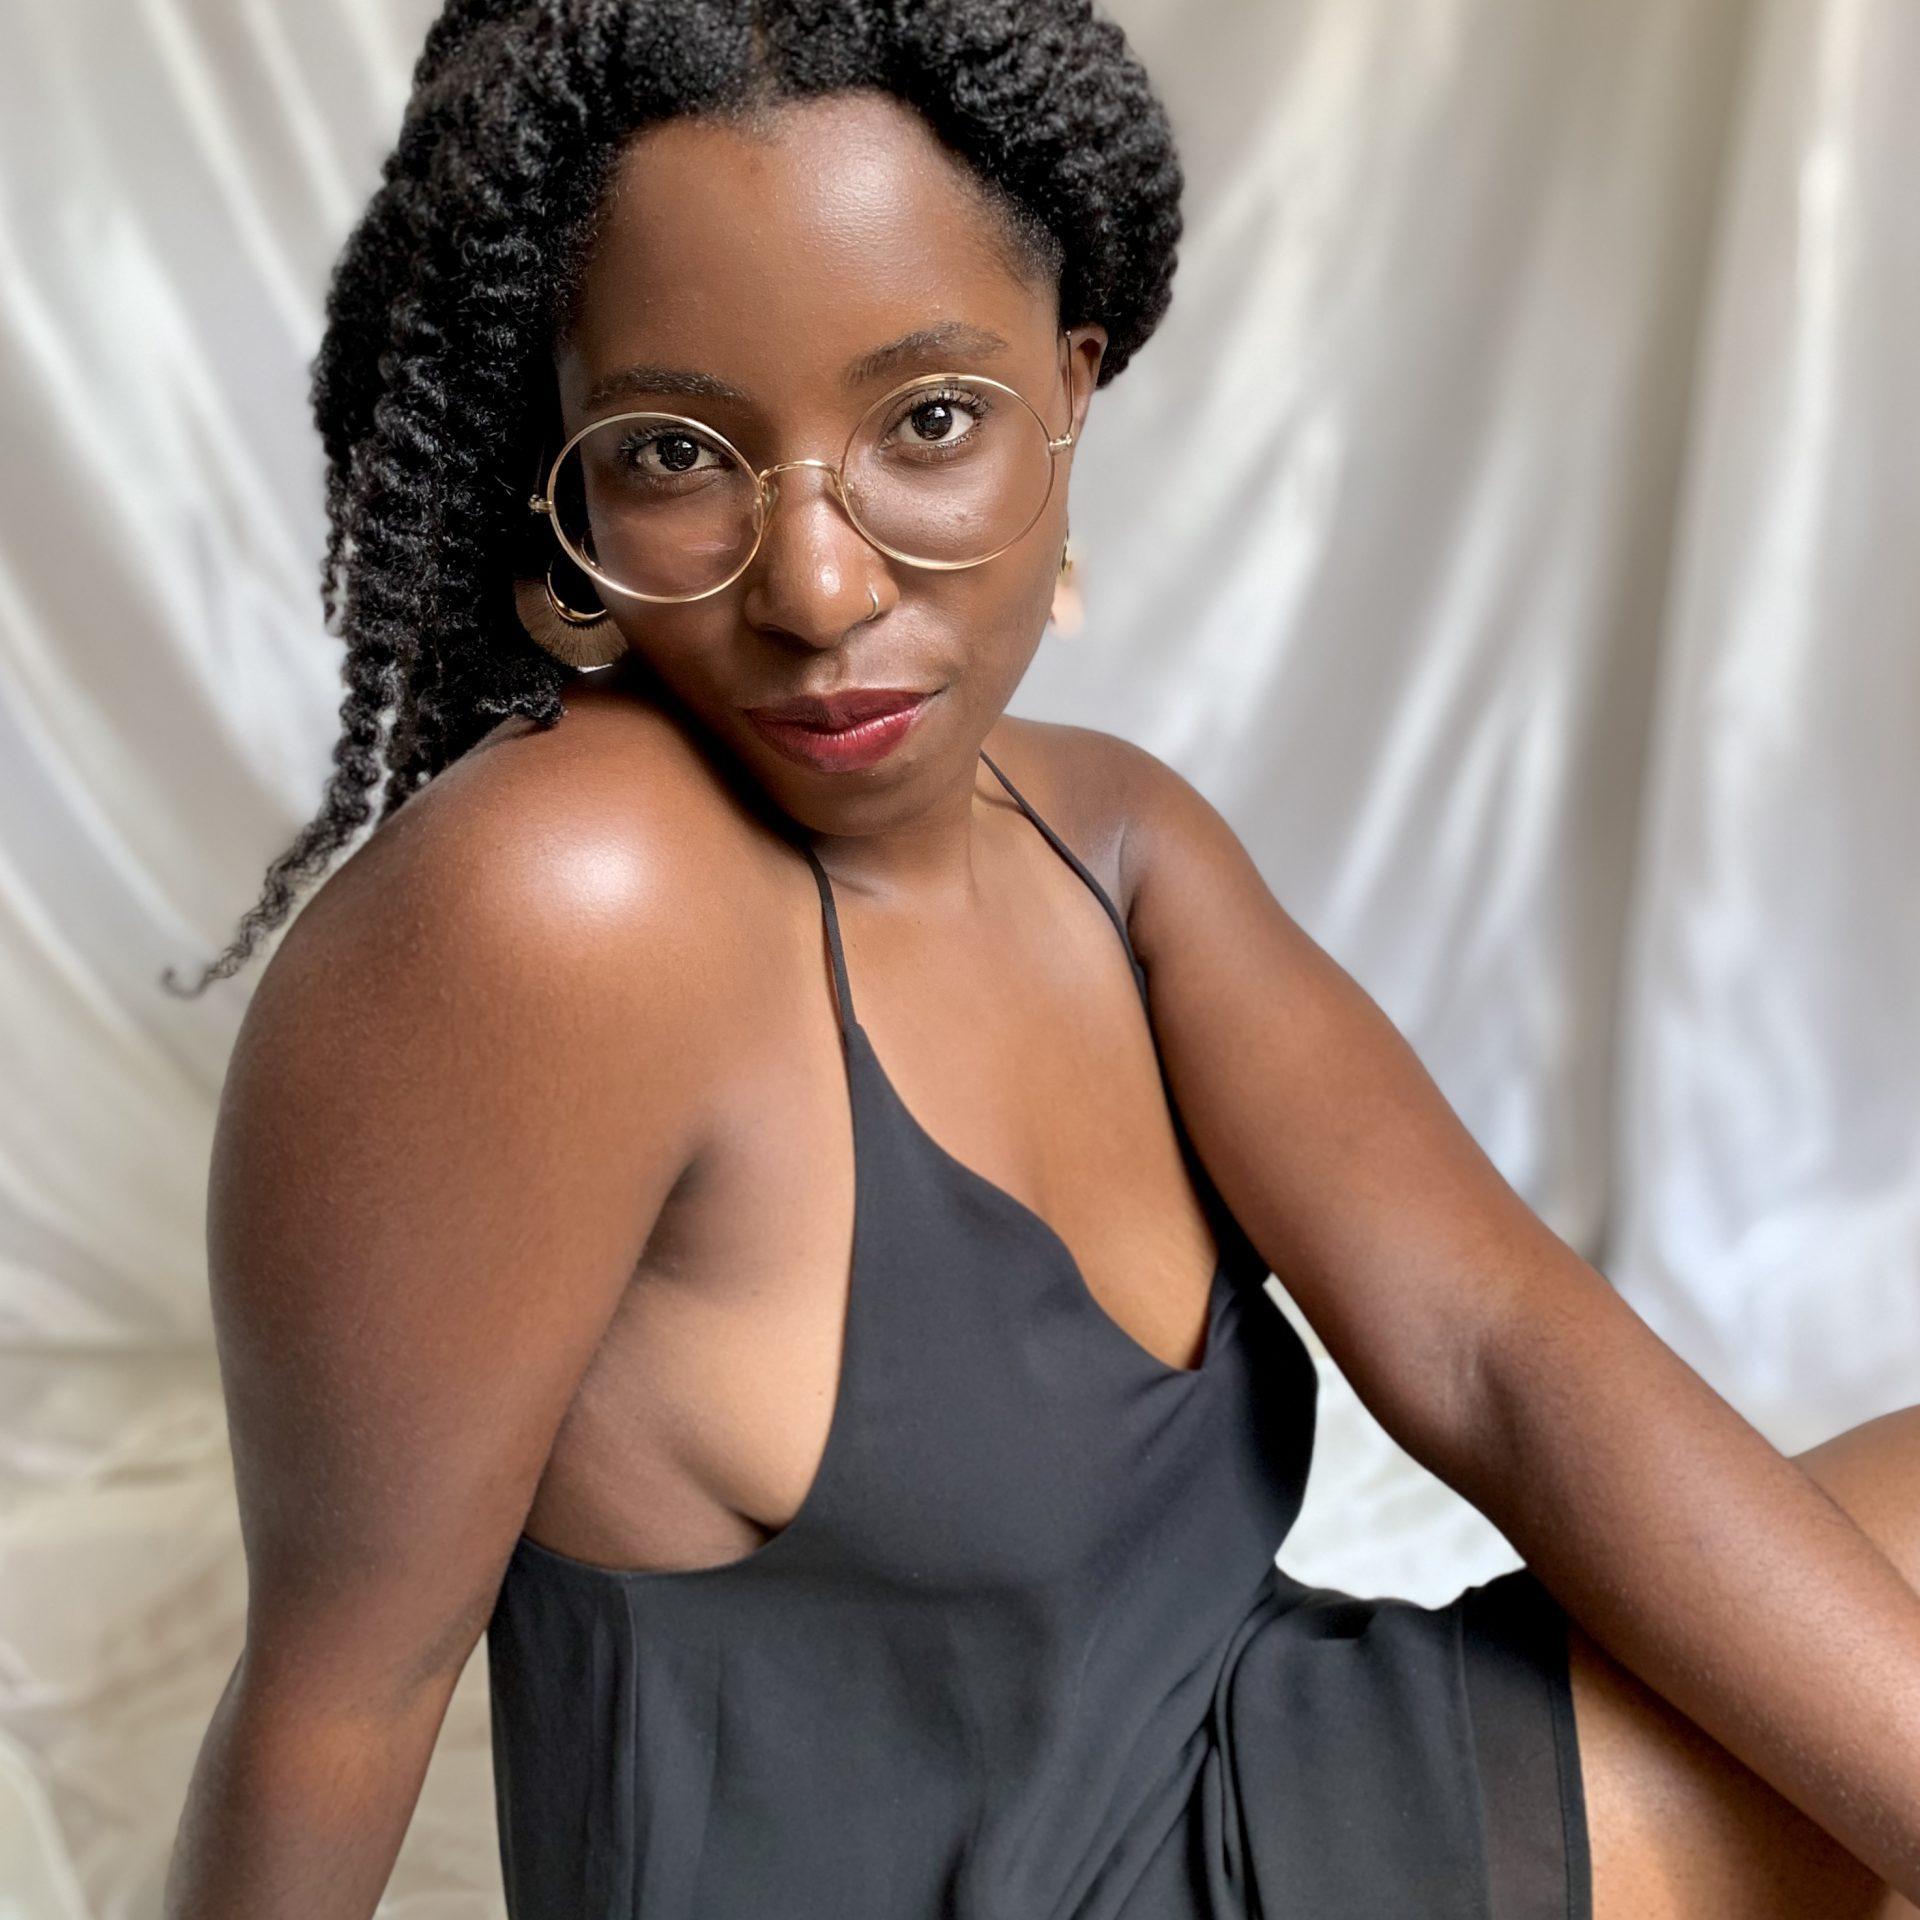 Yanique-Bell-Tantra-Sex-Coach-Satin-4 - Yanique Bell (1)